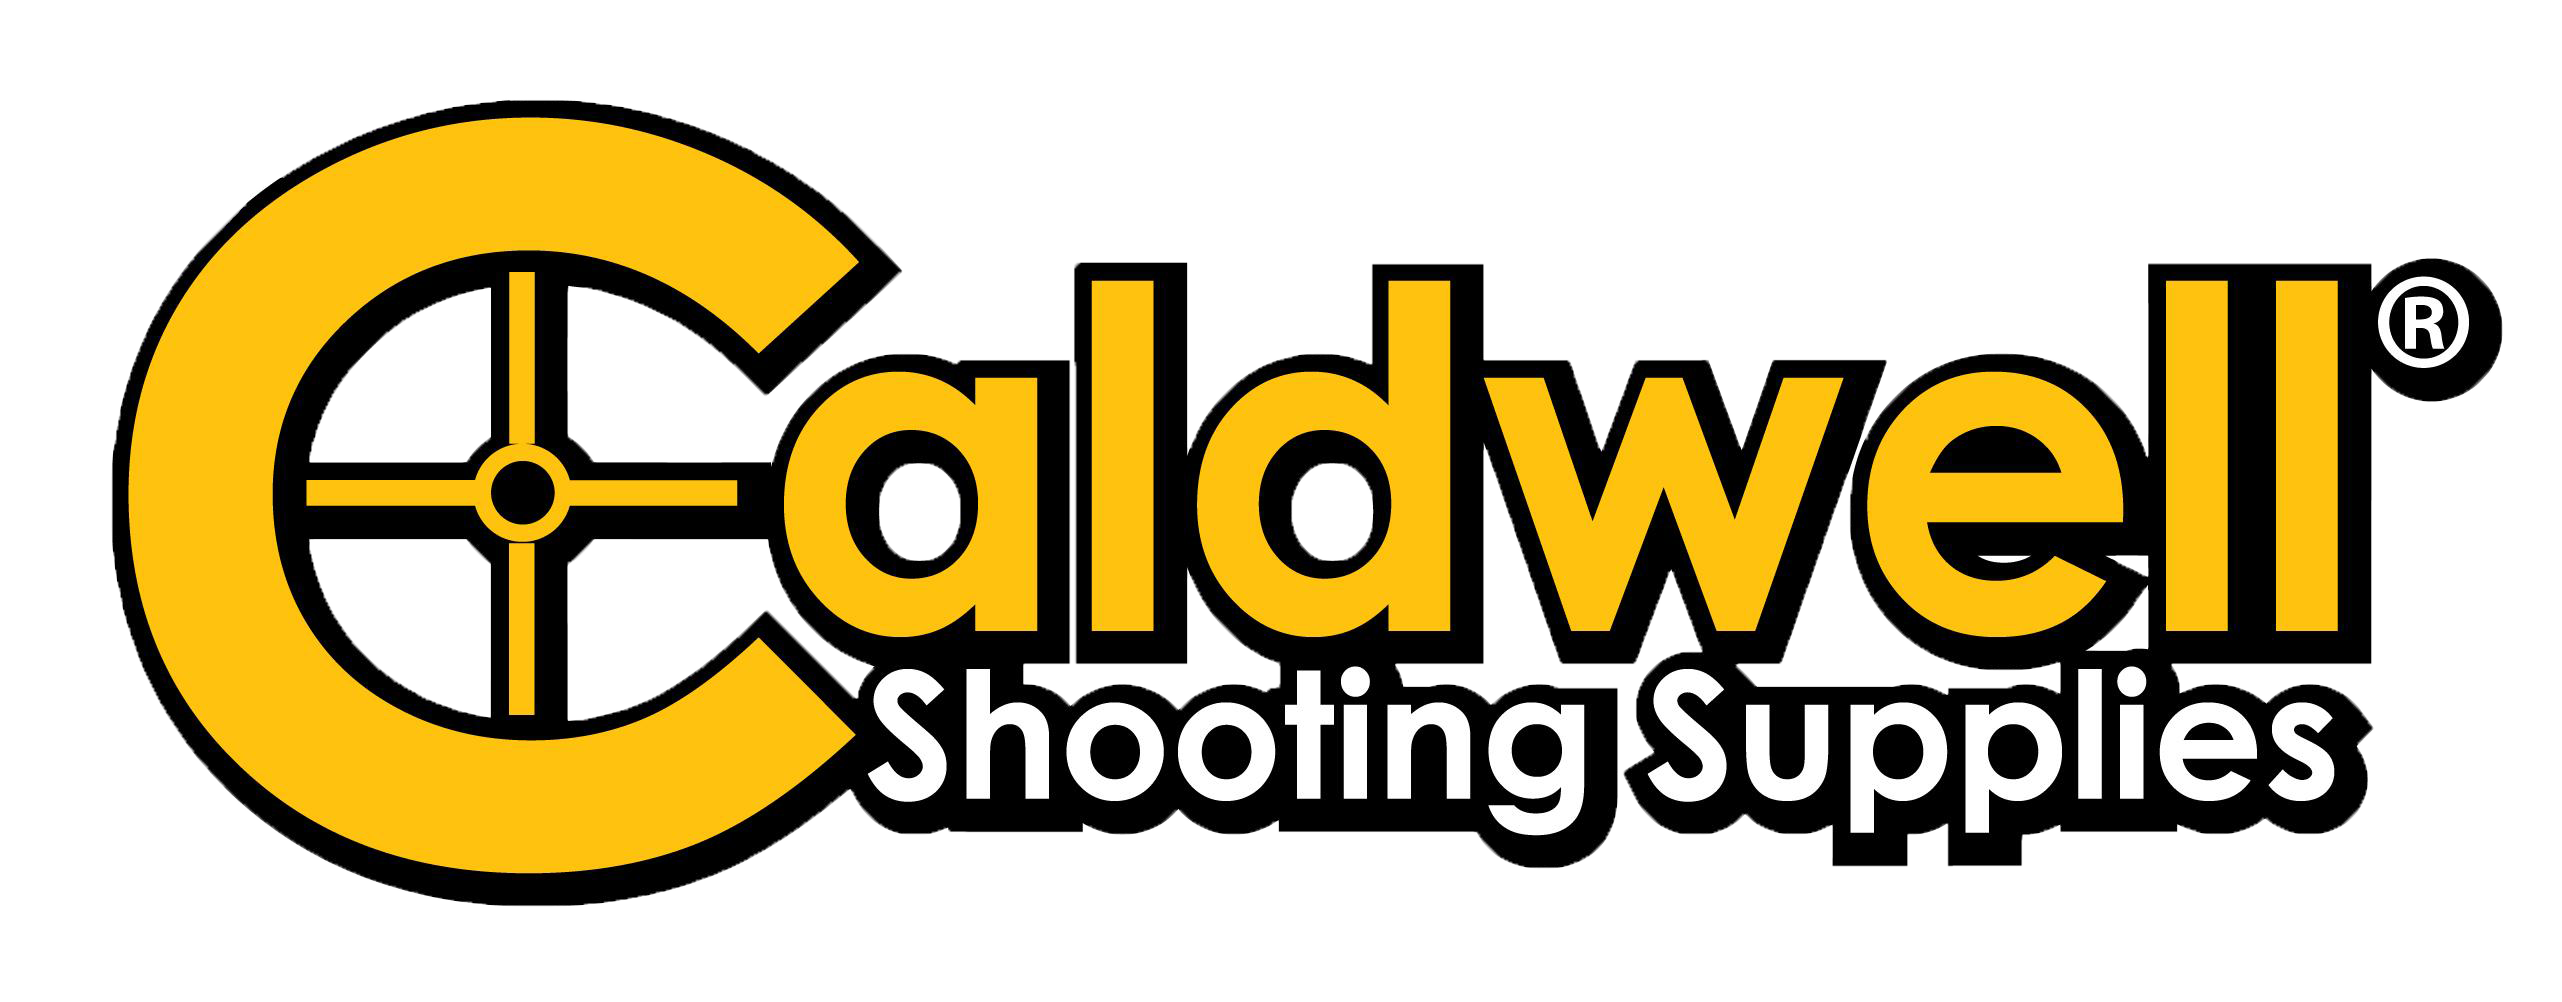 Caldwell Shooting Supplies